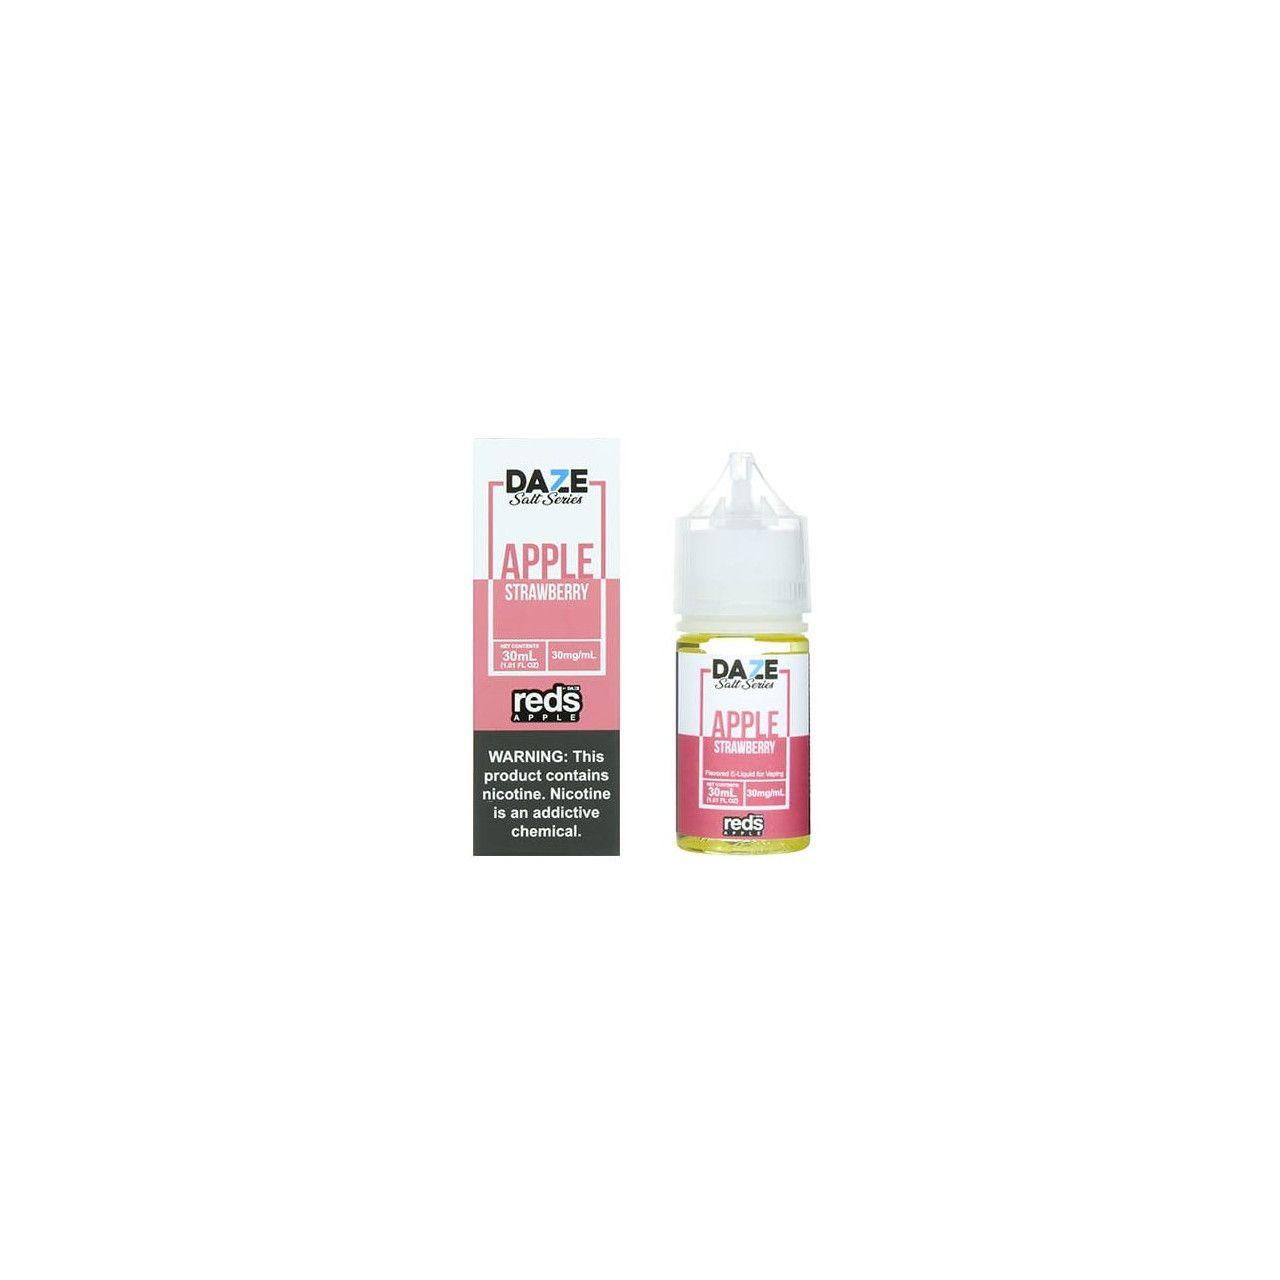 Líquido (Juice) - Nic Salt - 7 Daze - Reds Apple - Strawberry